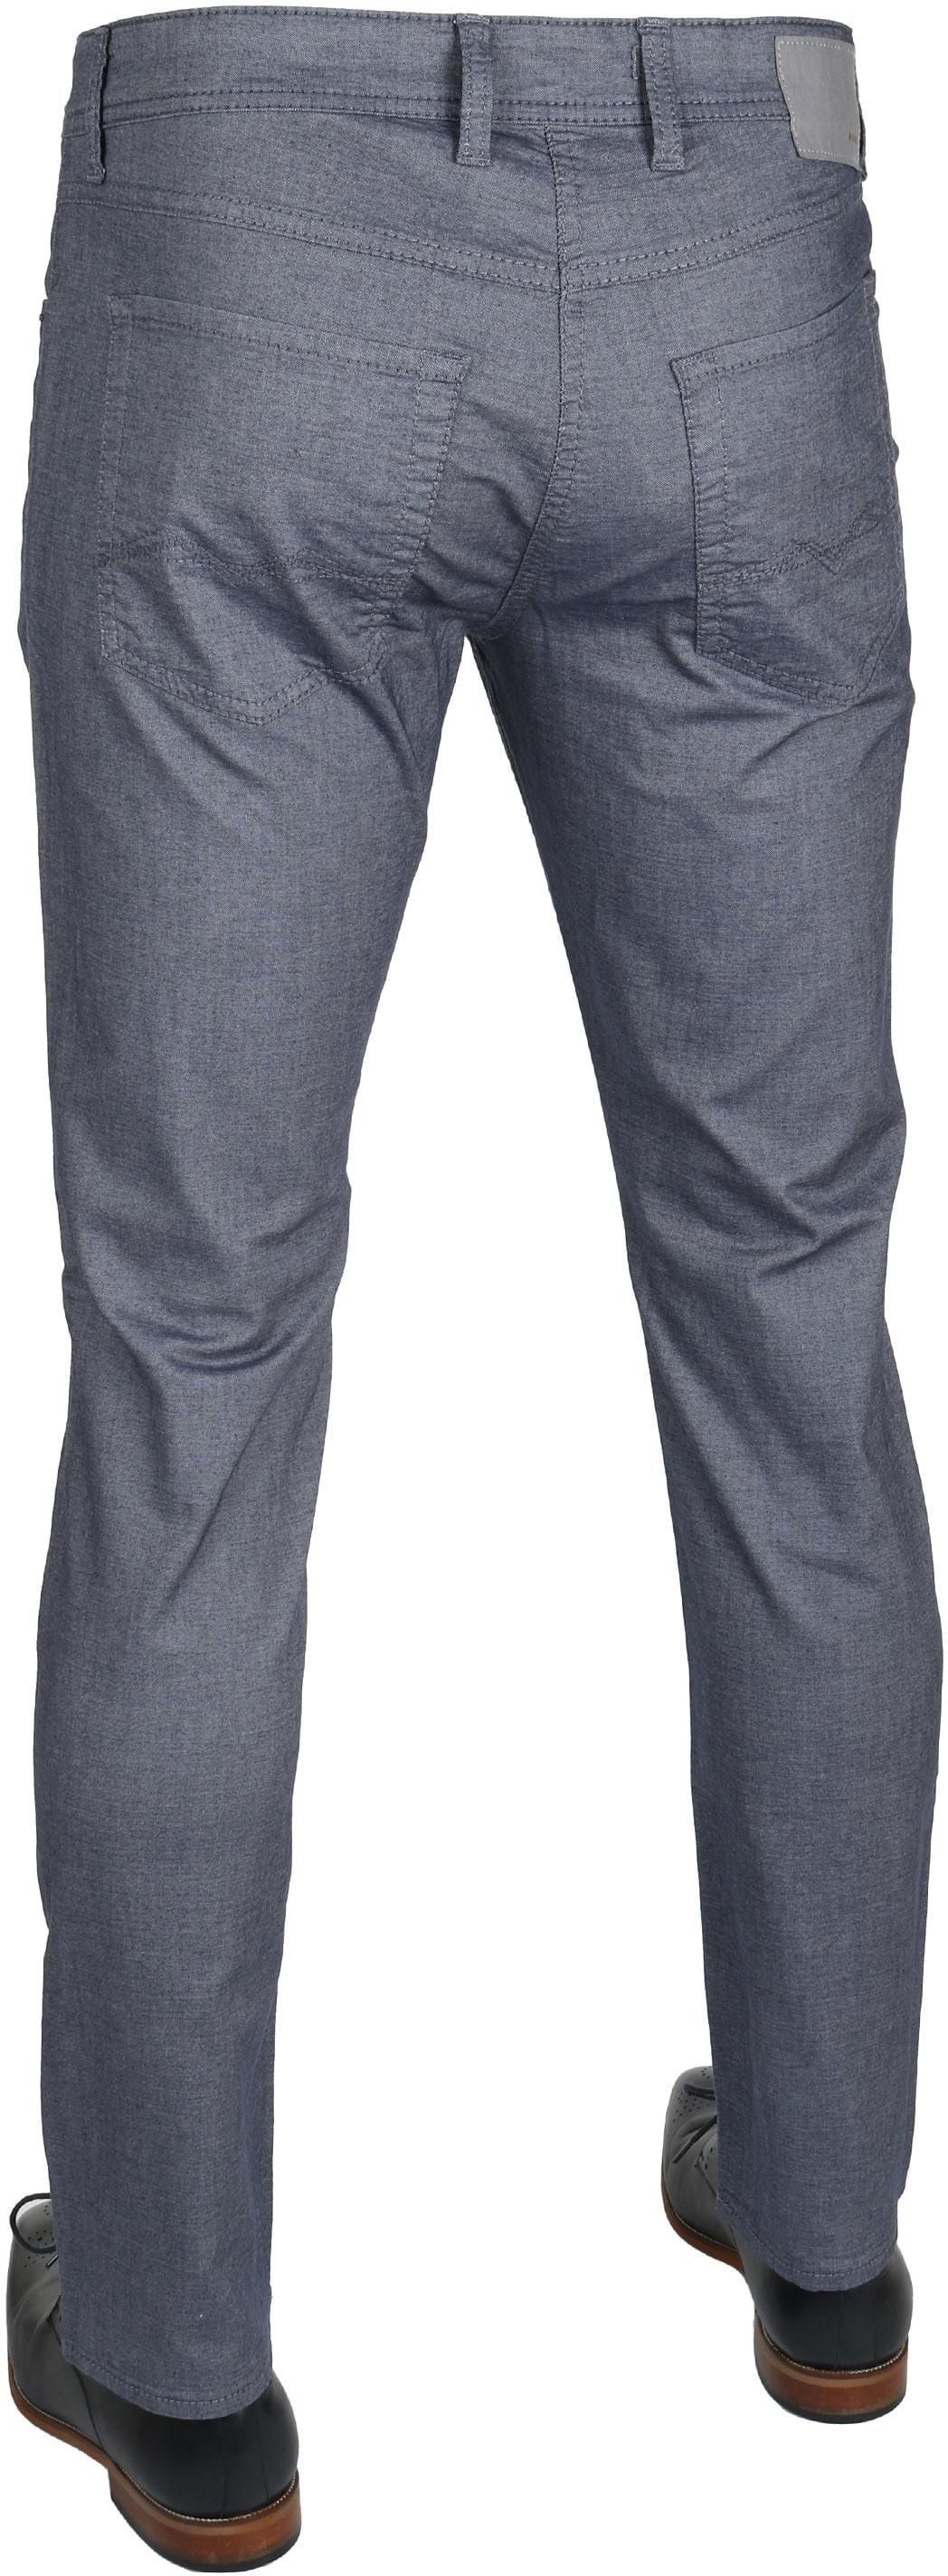 mac jeans arne modern fit blauw grijs online bestellen suitable. Black Bedroom Furniture Sets. Home Design Ideas